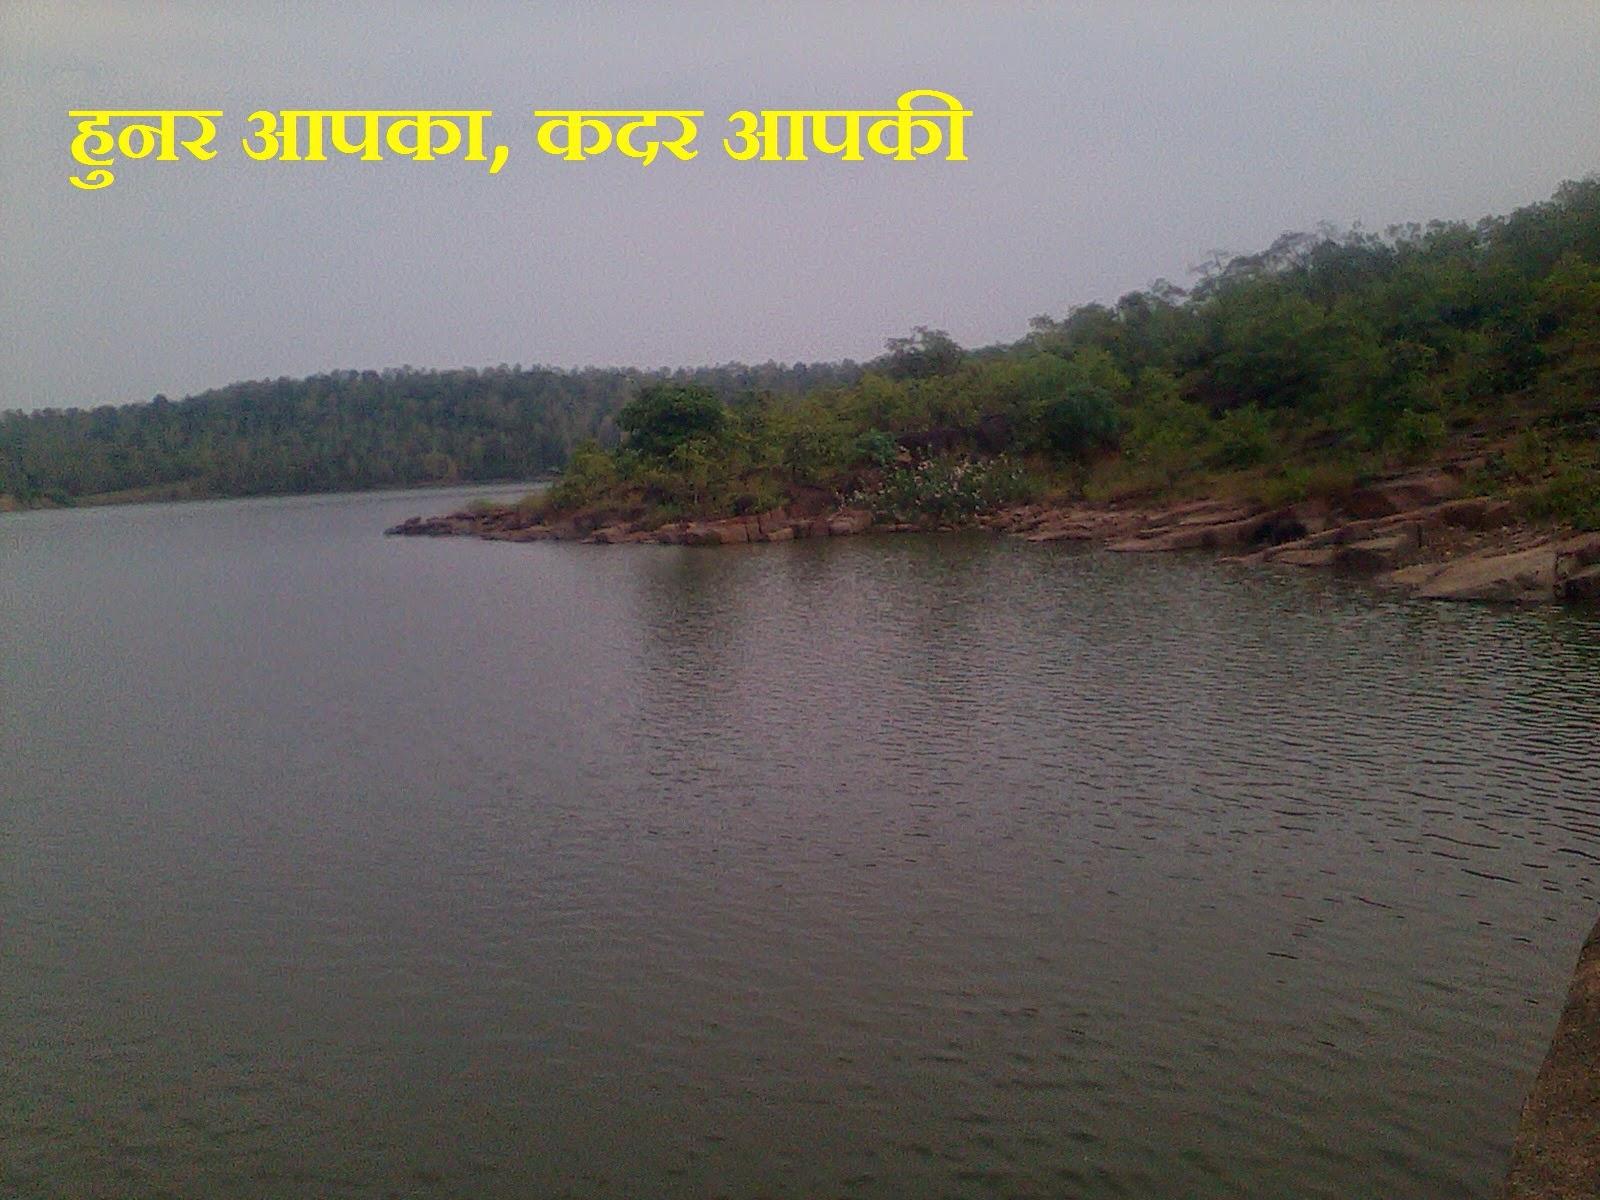 http://www.anilsahu.blogspot.in/2014/11/apne-hunar-ko-apni-pahchan-banaiyemotivational-article-in-hindi.html